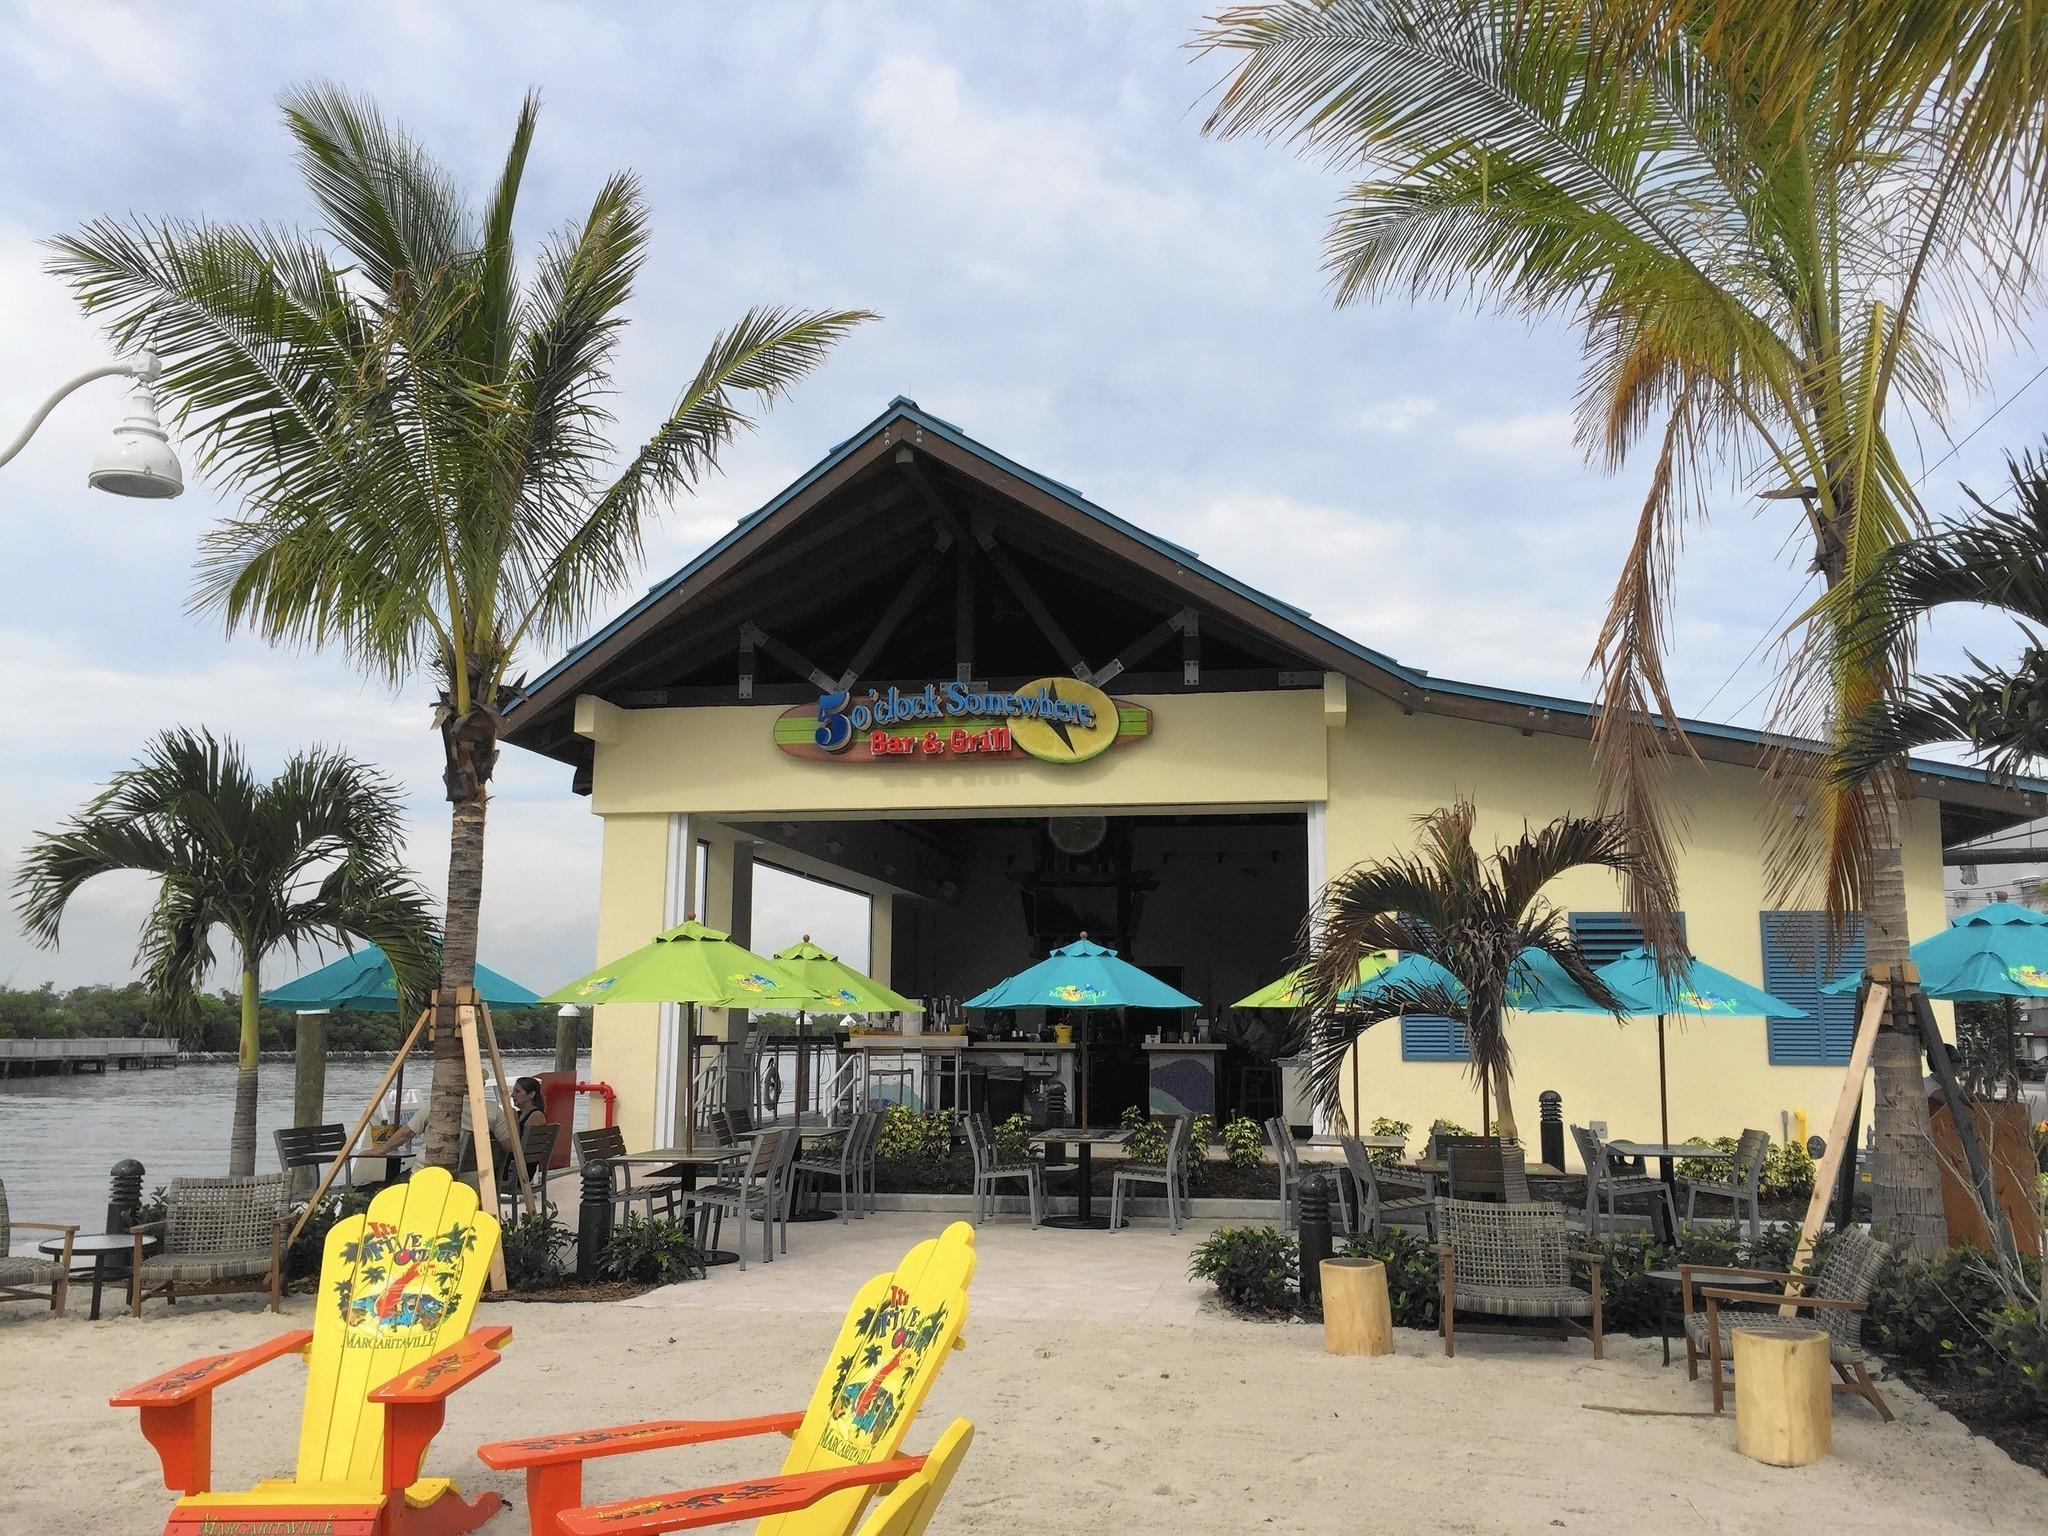 Image Result For Margaritaville Hollywood Beach Resort Package